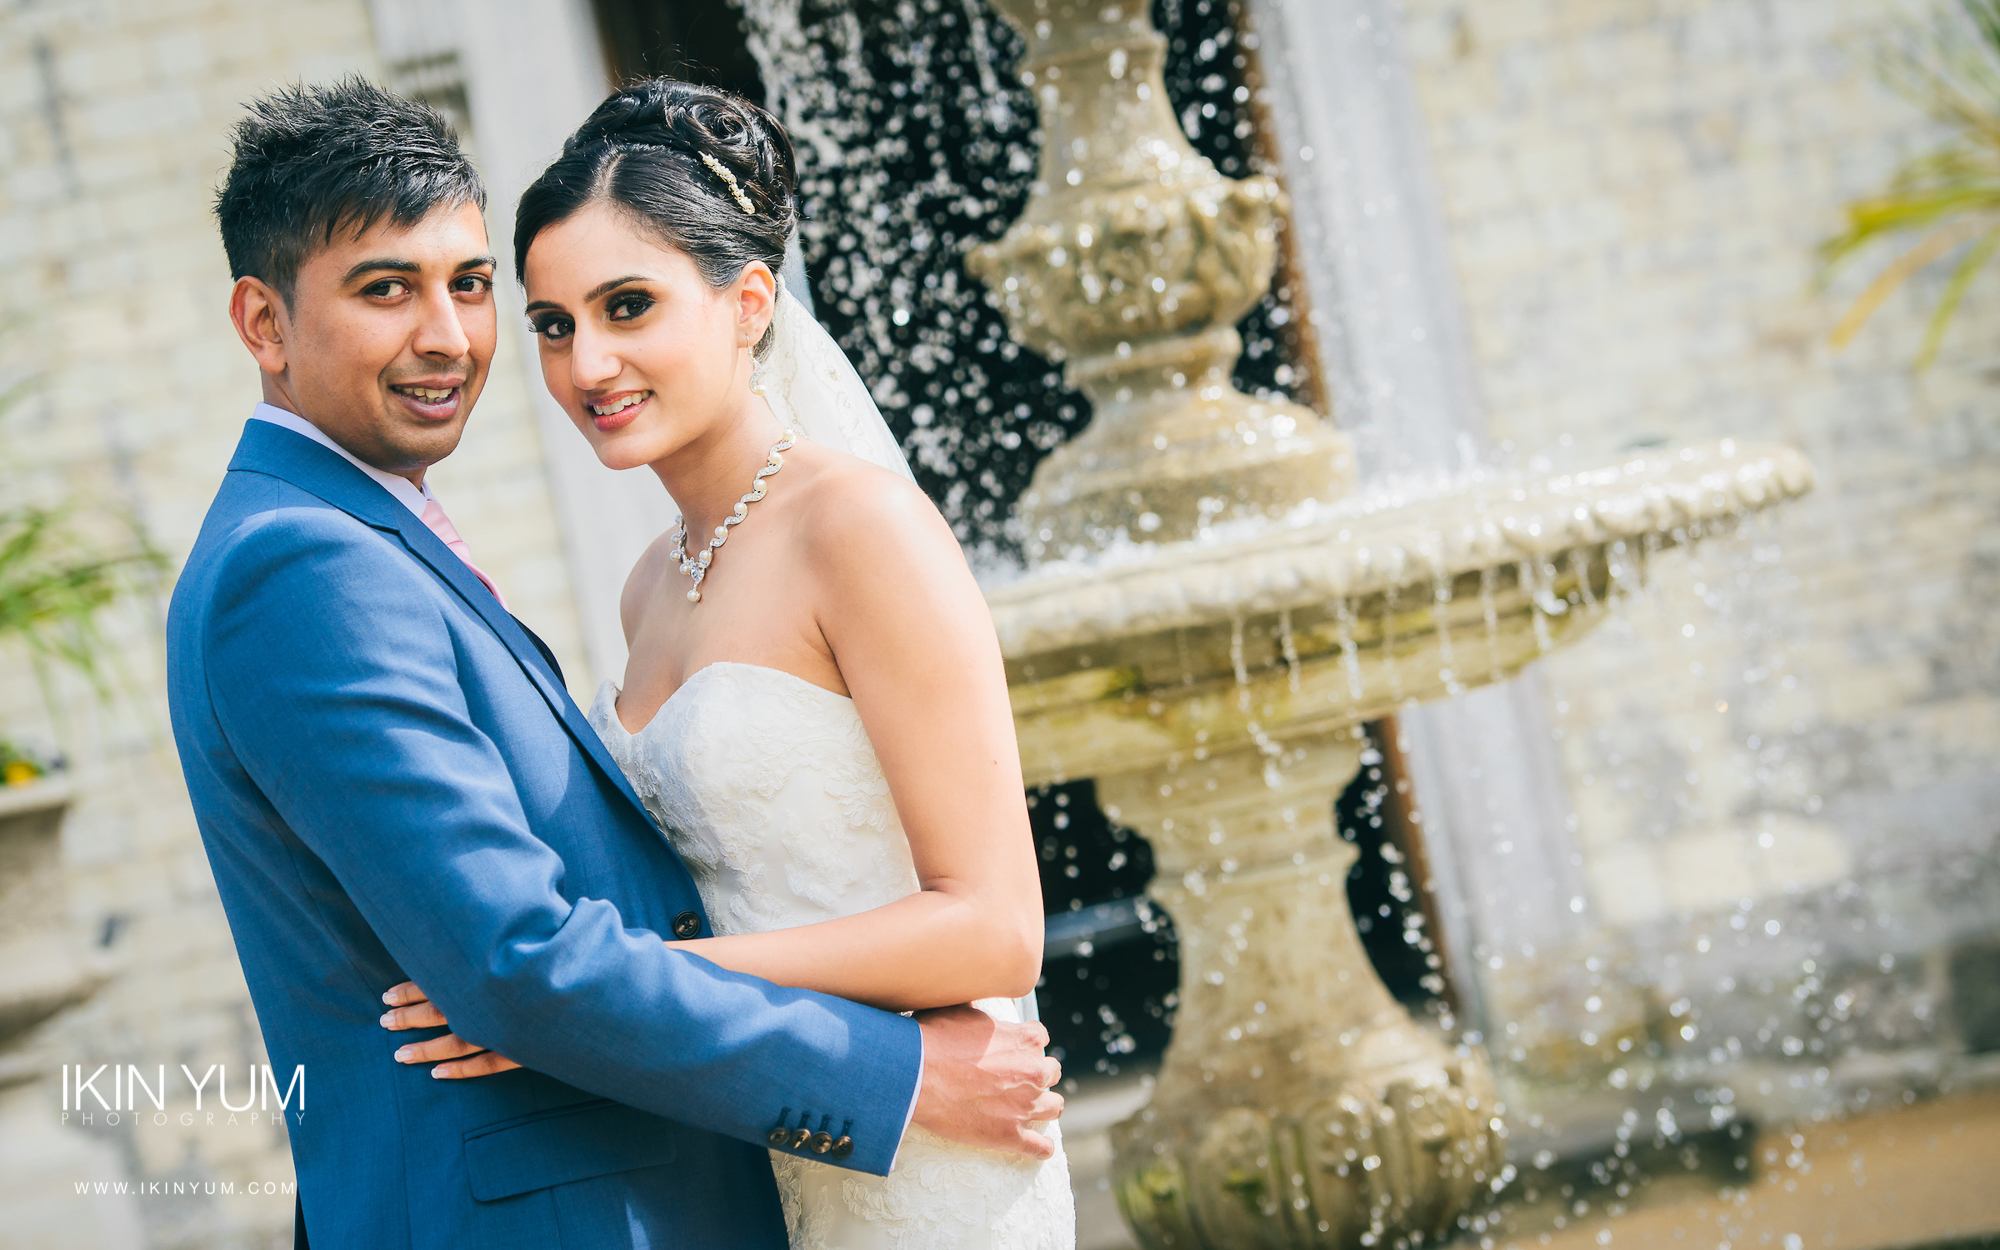 Froyle Park Indian Wedding - Ikin Yum Photography-088.jpg